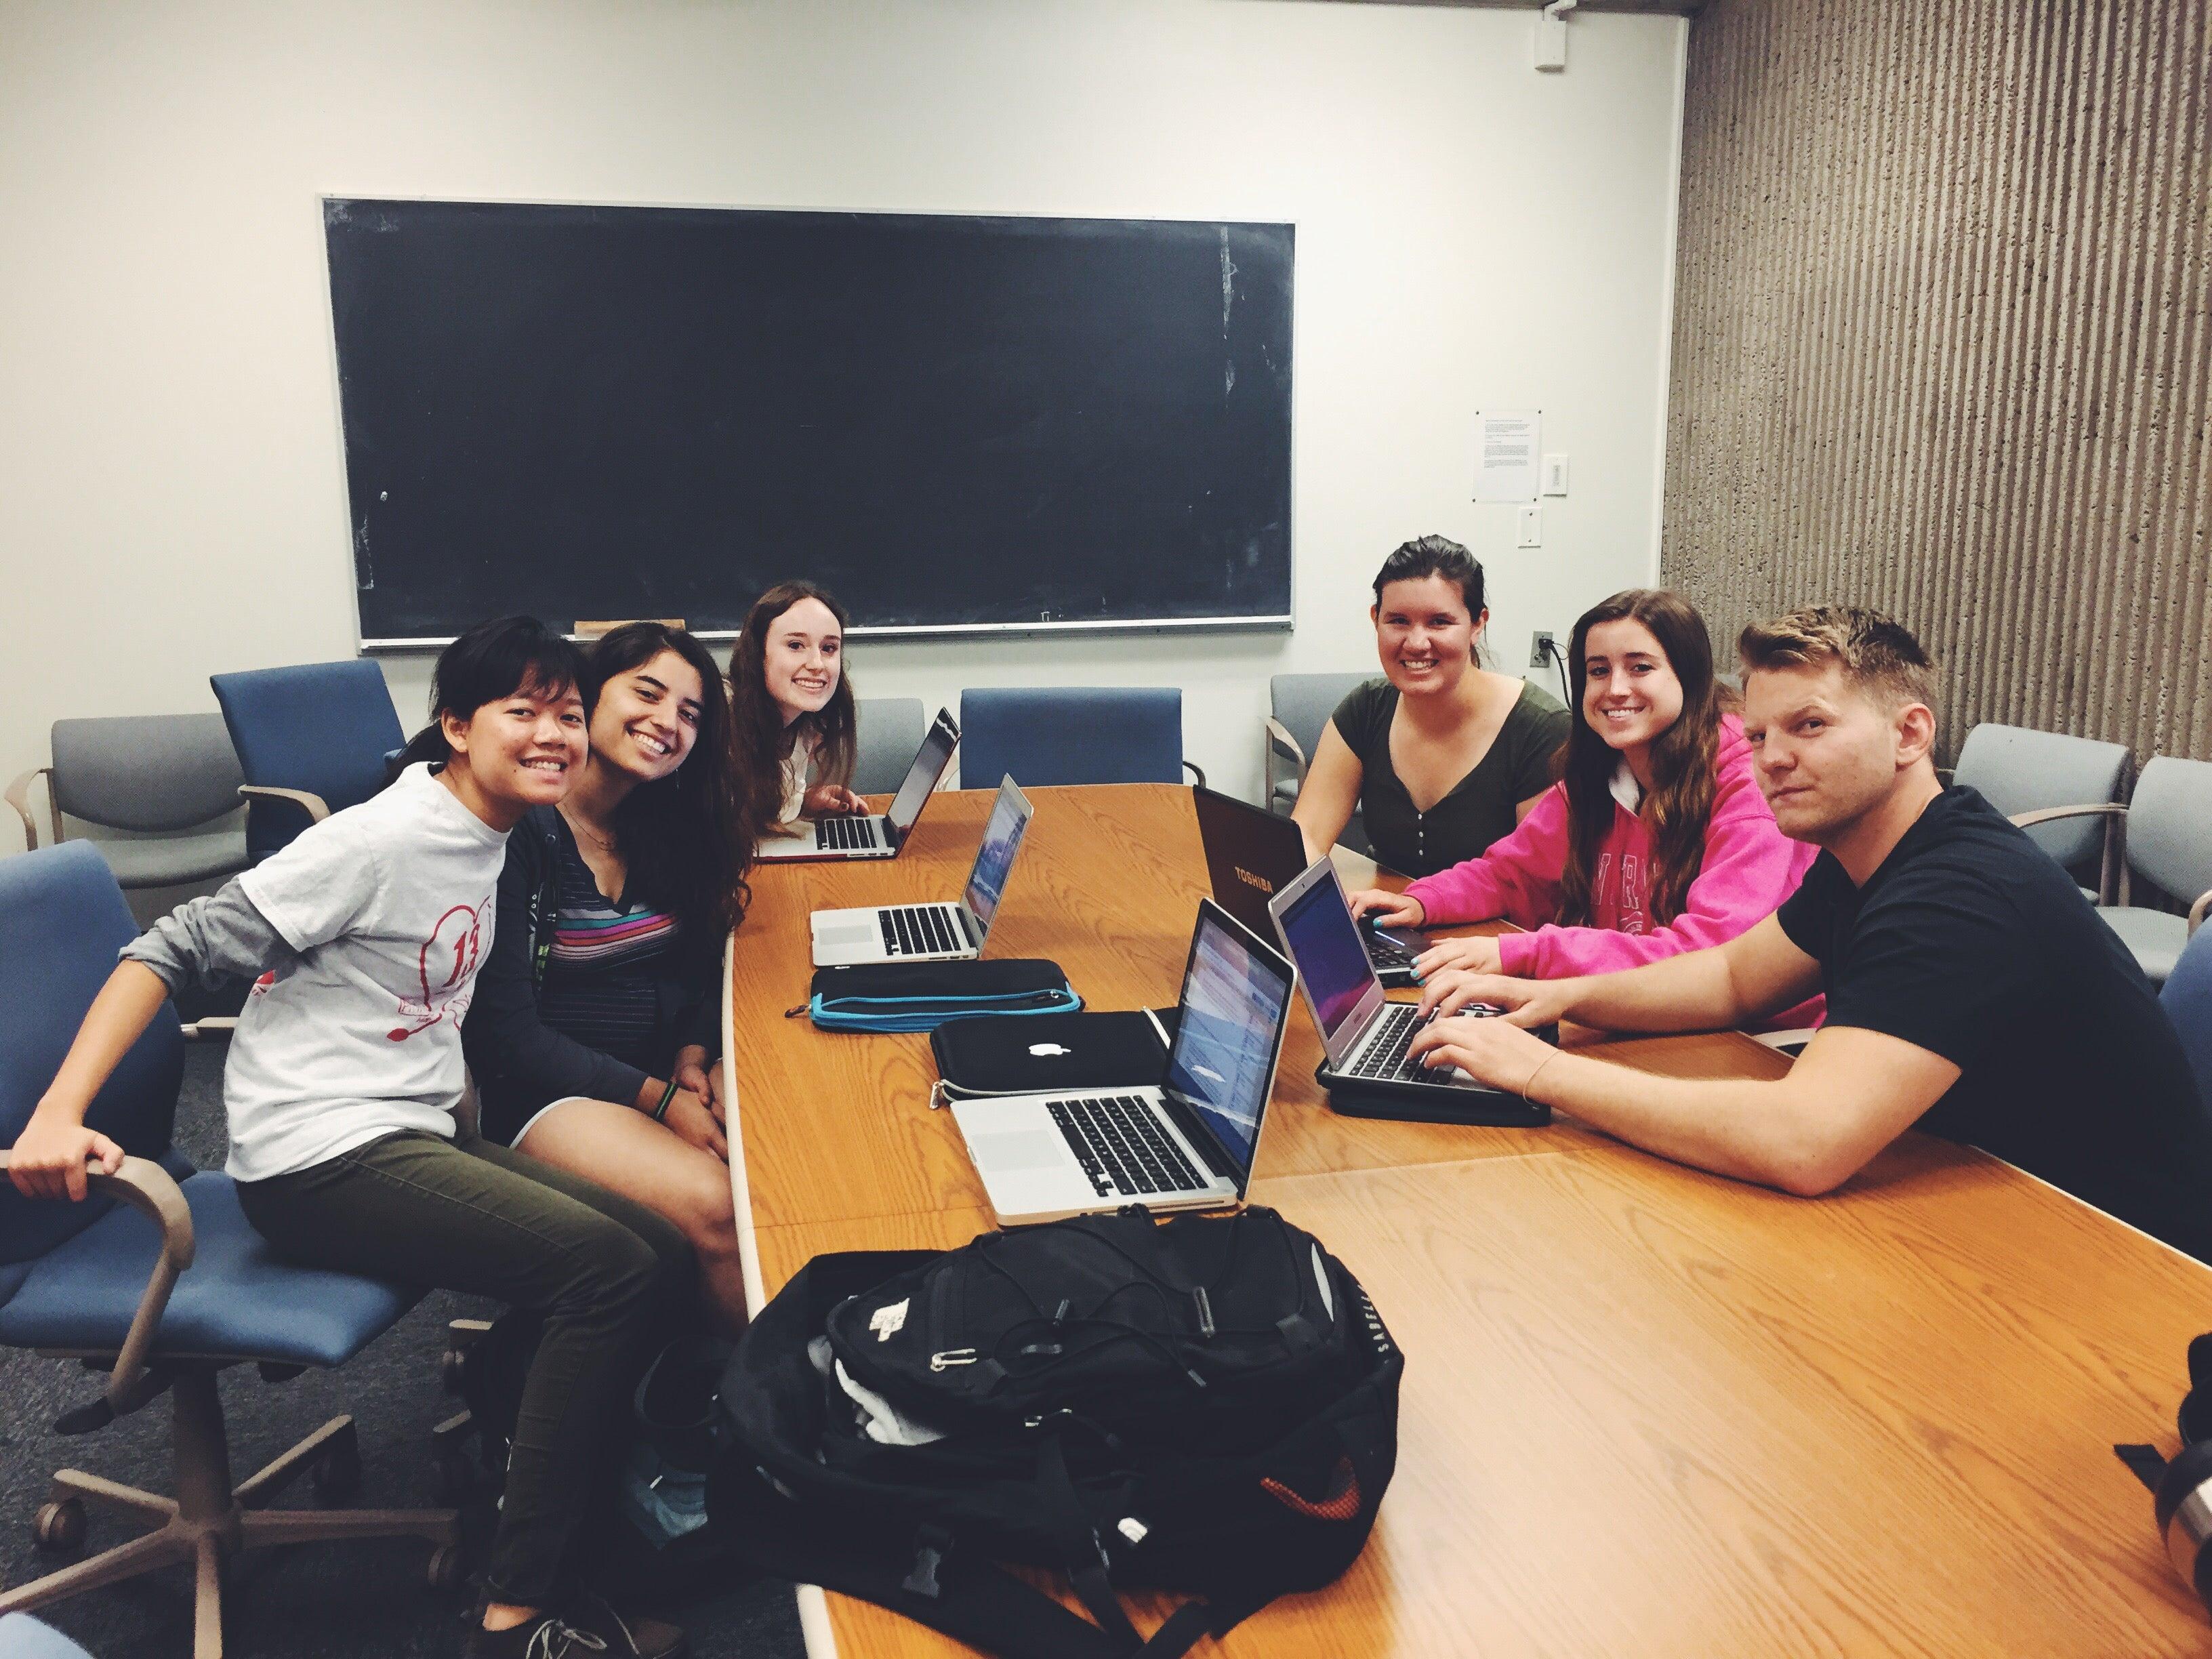 Editorial Board 2014-2015 (Left to right) Hong, Editor, Marisa, Briga, Nicole, David. Not pictured: Natalie